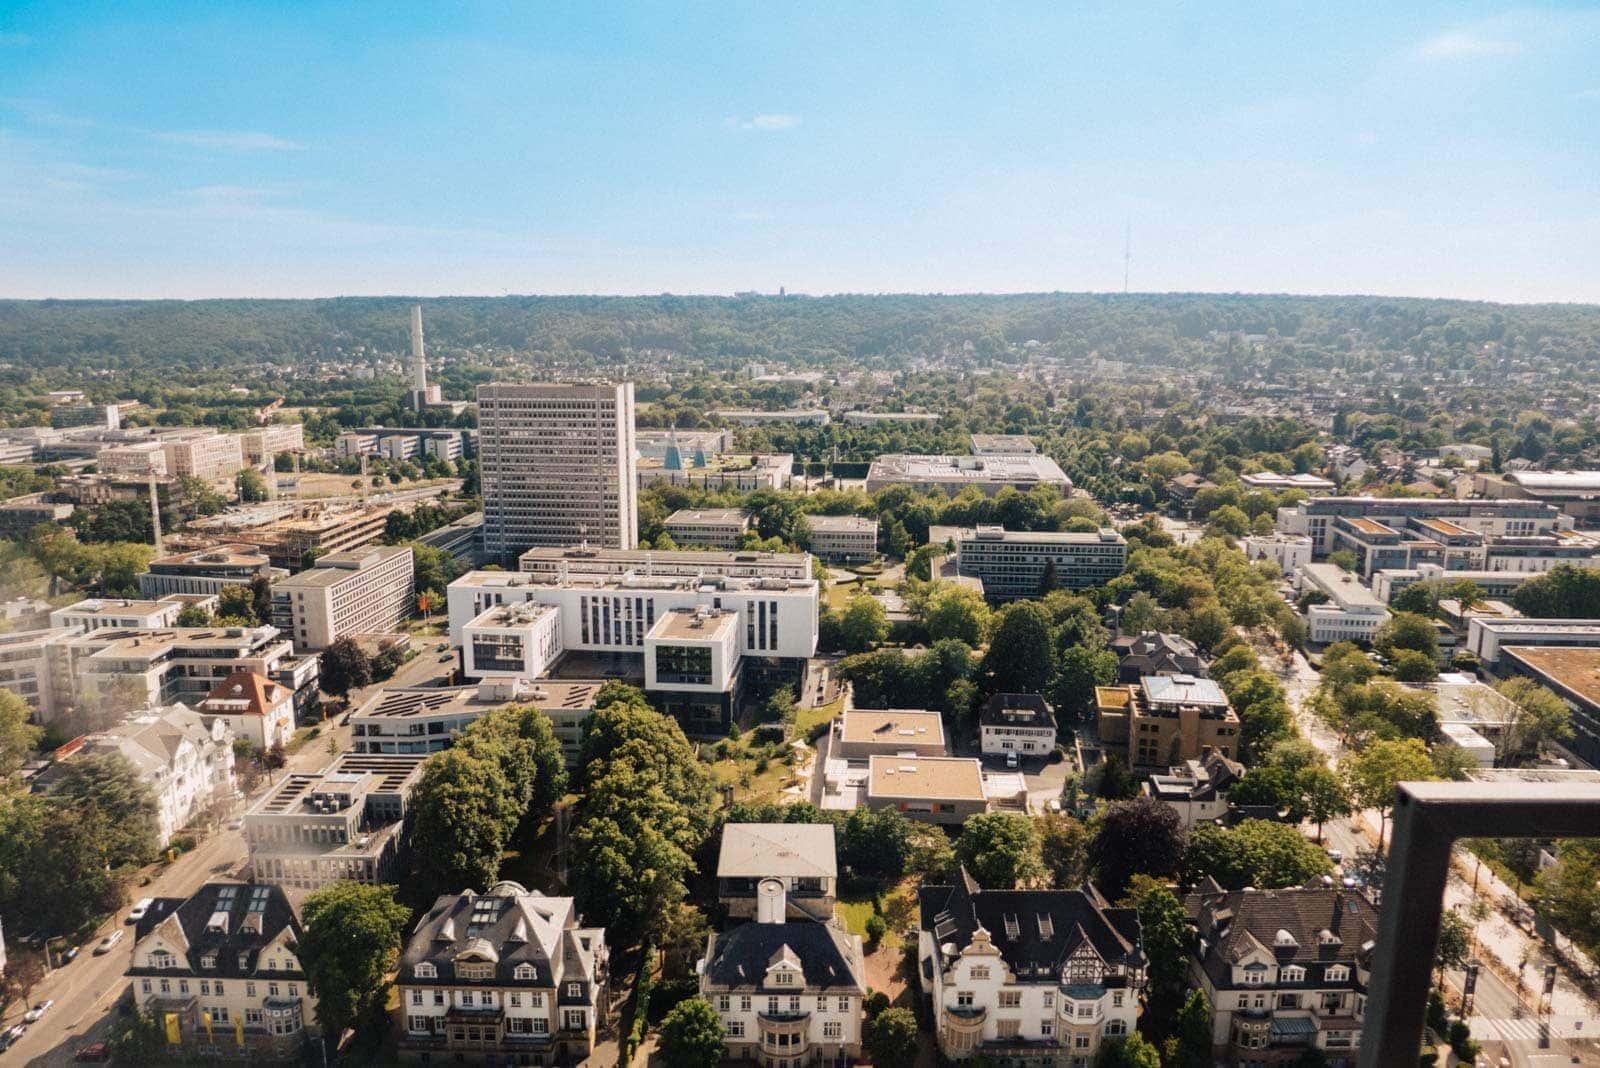 Die Stadt Bonn fotografiert aus dem langen Eugen